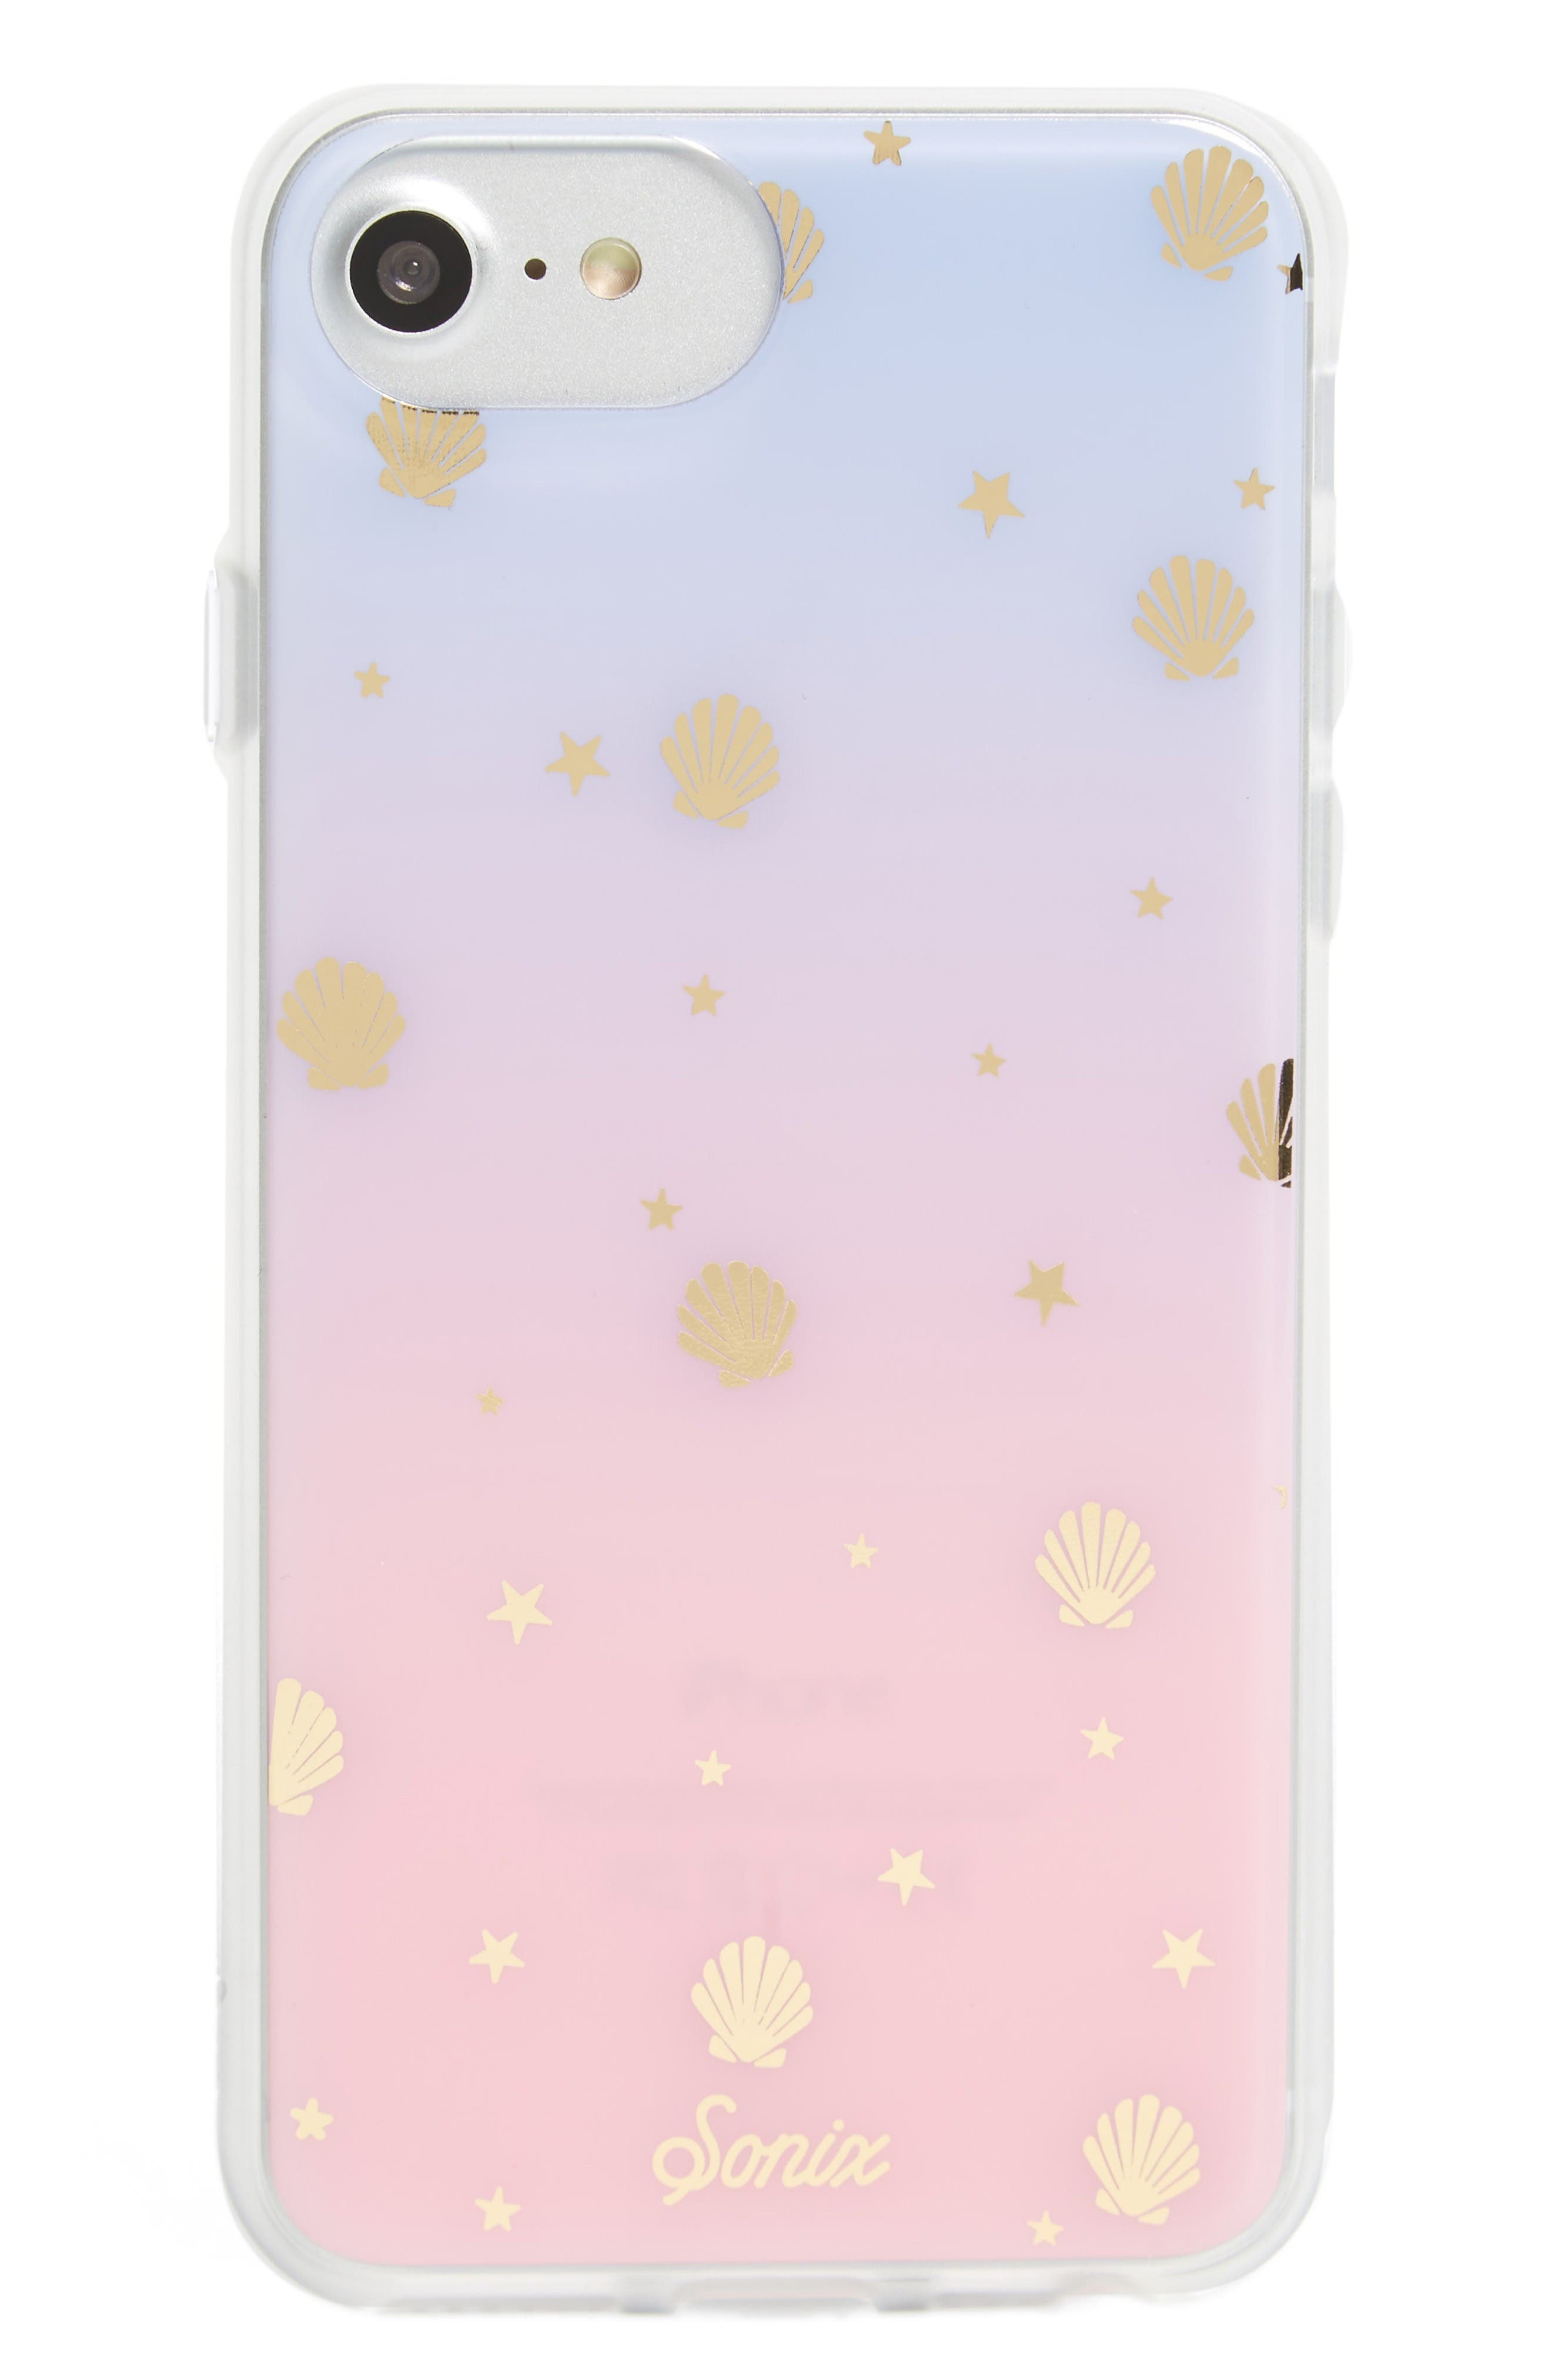 Alternate Image 1 Selected - Sonix Mermaid Dream iPhone 6/7 & 6/7 Plus Case